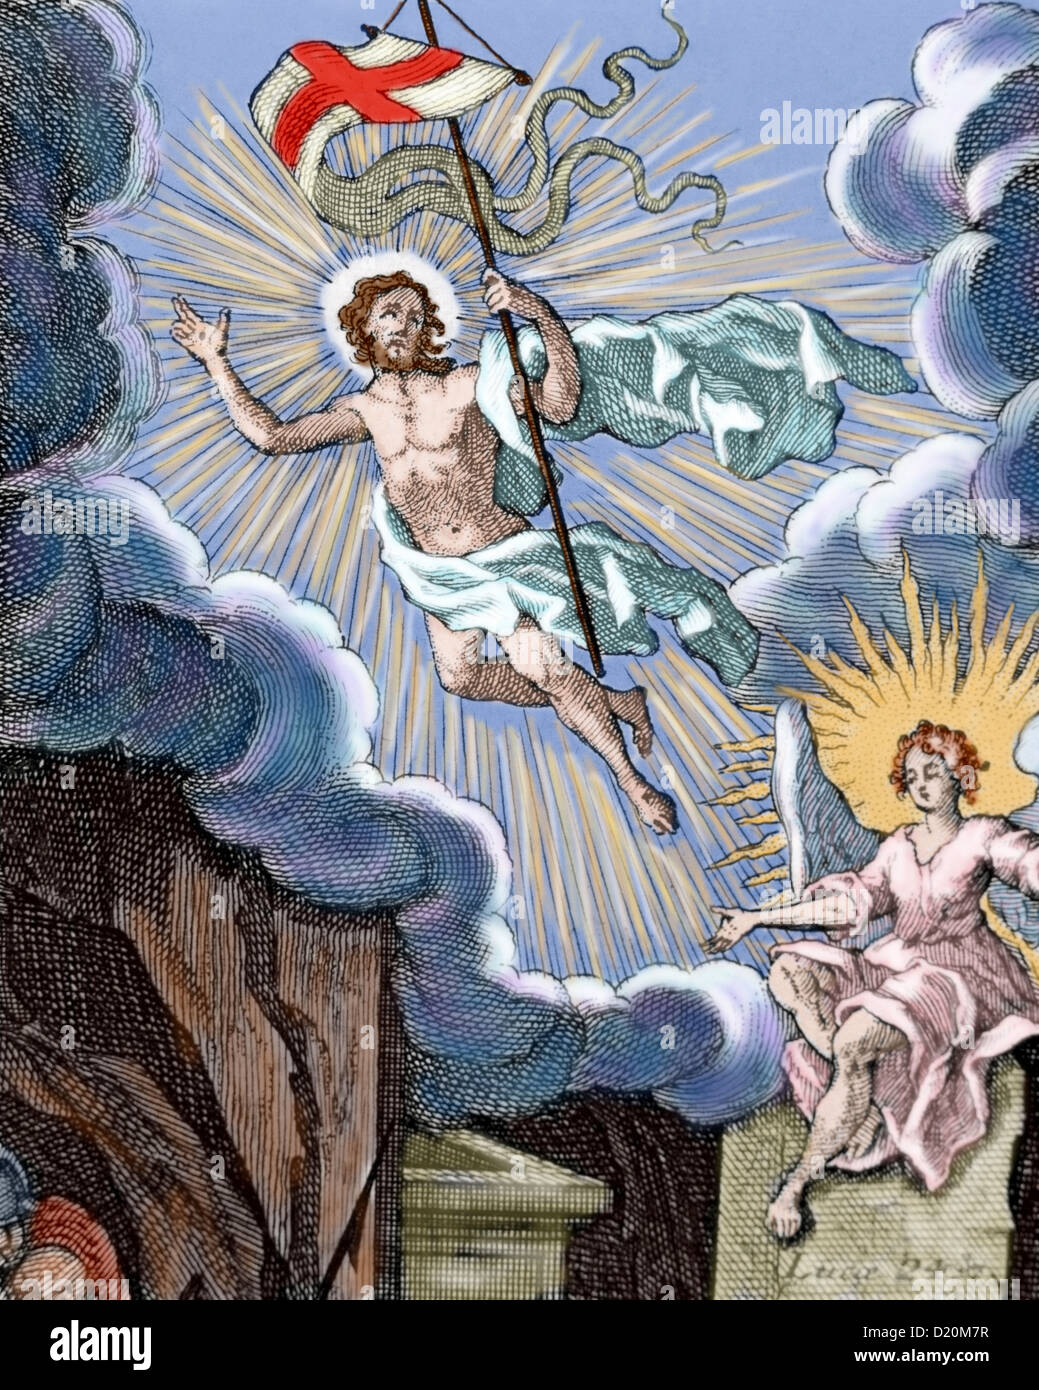 Luke 24. Resurrection of Jesus. Colored engraving. - Stock Image